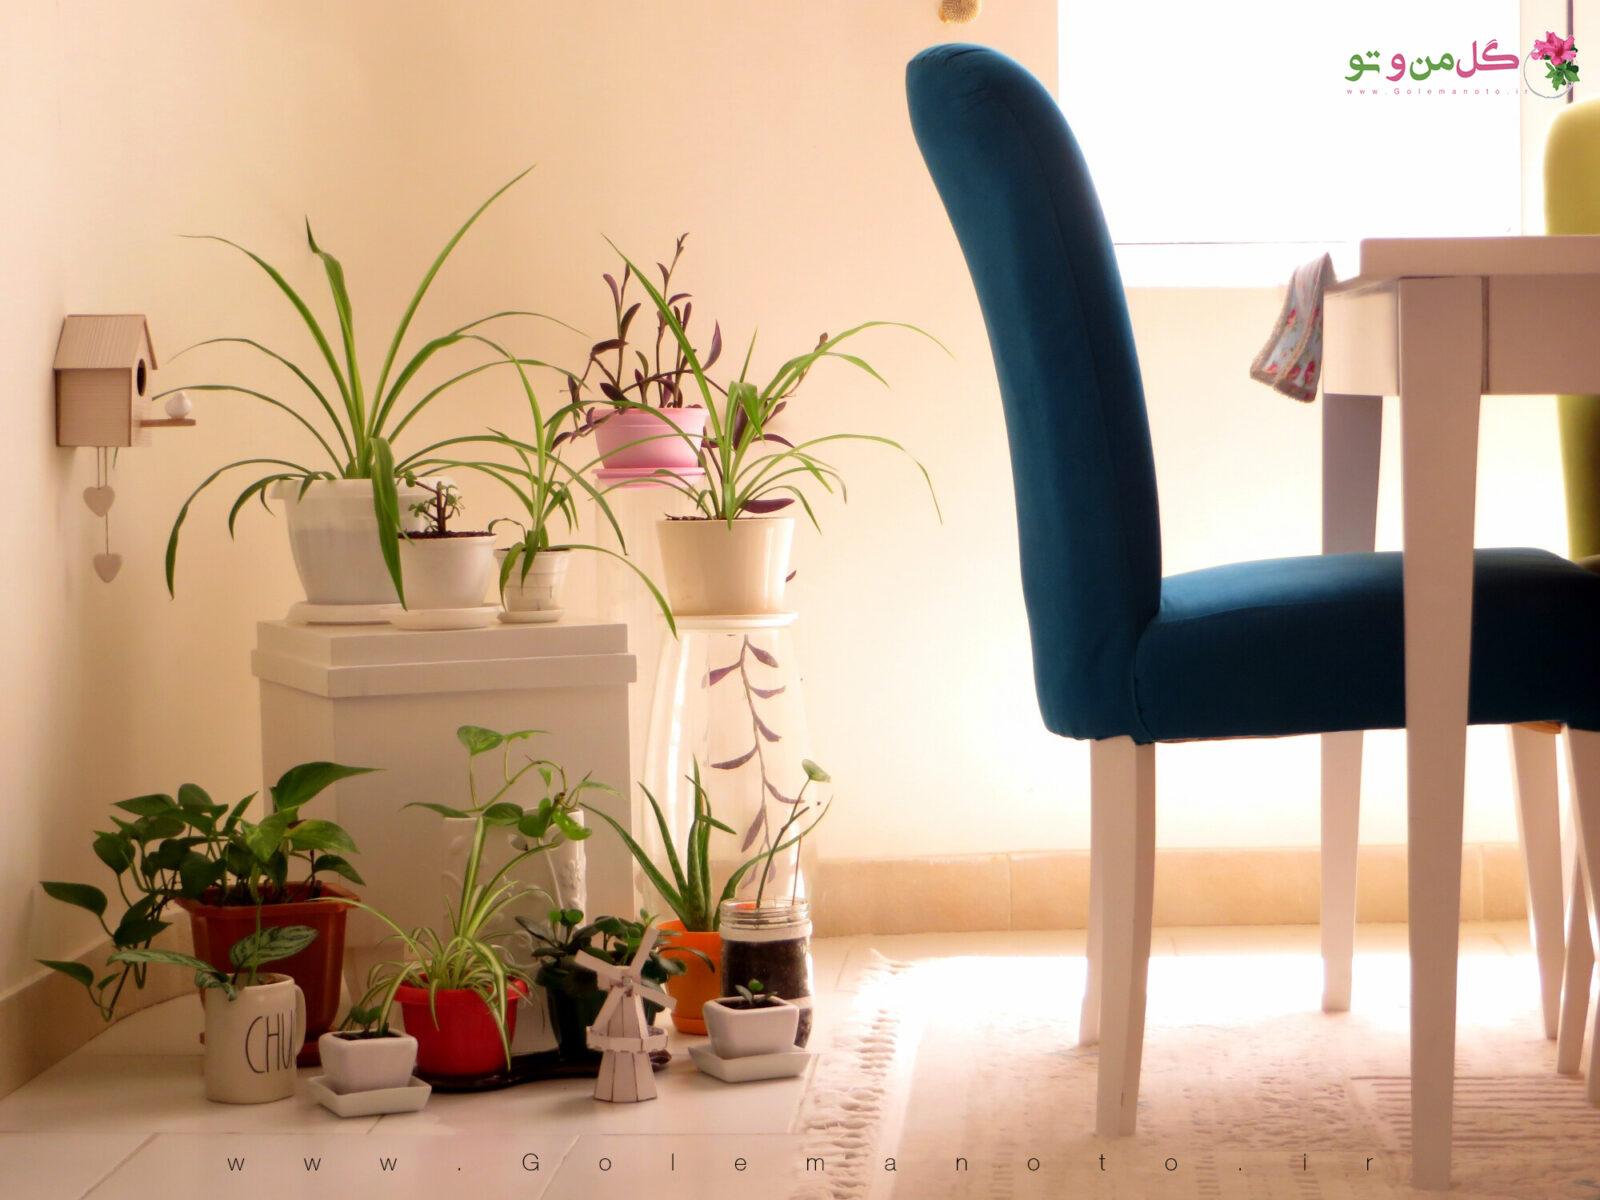 گل من و تو - دکوراسیون خانه